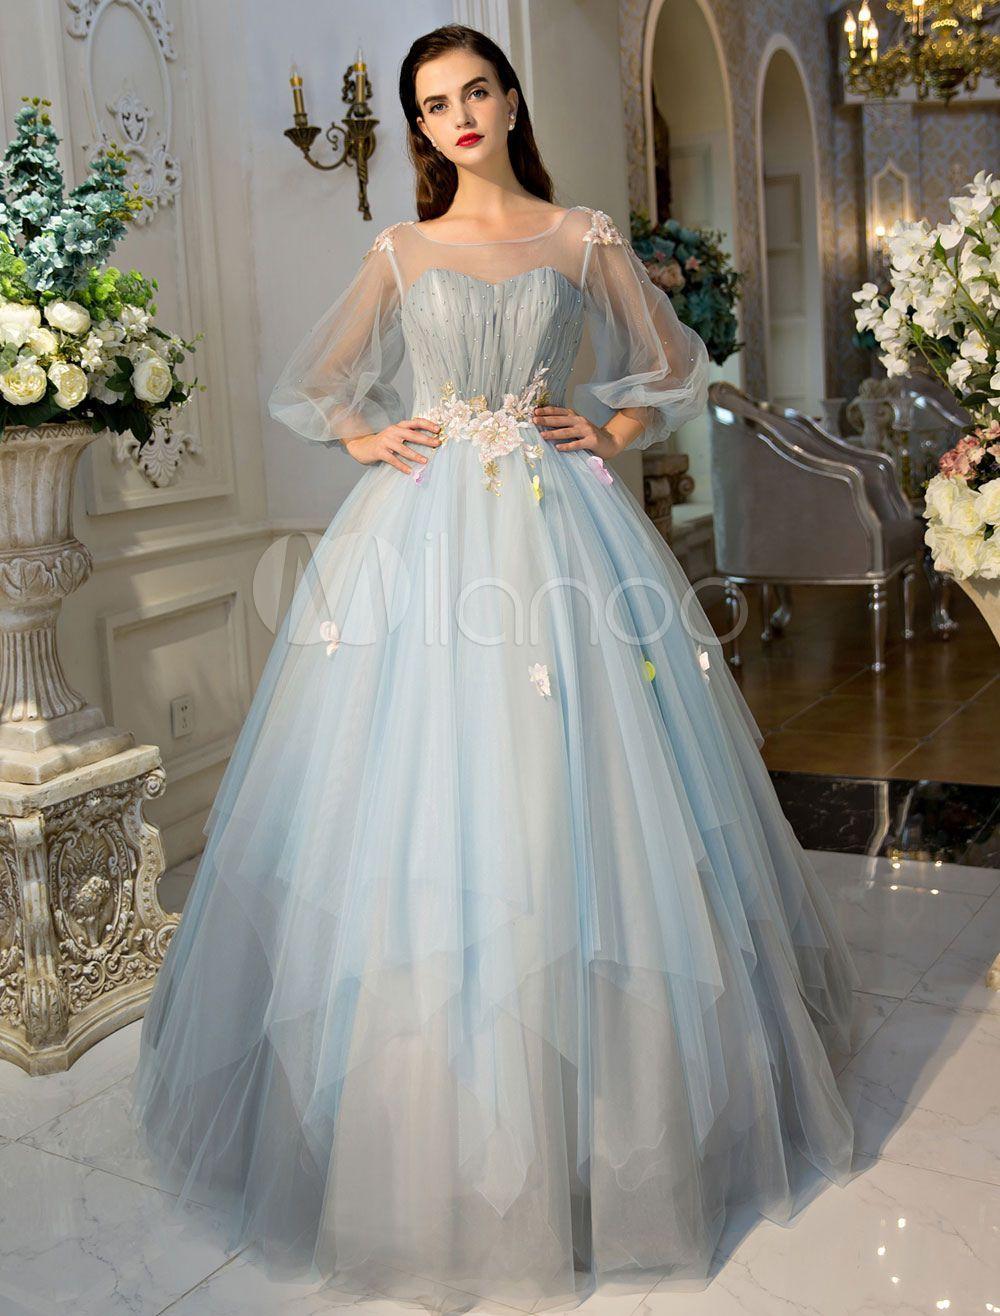 Princess Prom Dresses Luxury Long Sleeve Illusion Tulle Lace Flowers Beaded Baby Blue Tiered Women S Pageant Dre Balo Elbiseleri Balo Elbisesi Parti Elbiseleri [ 1316 x 1000 Pixel ]